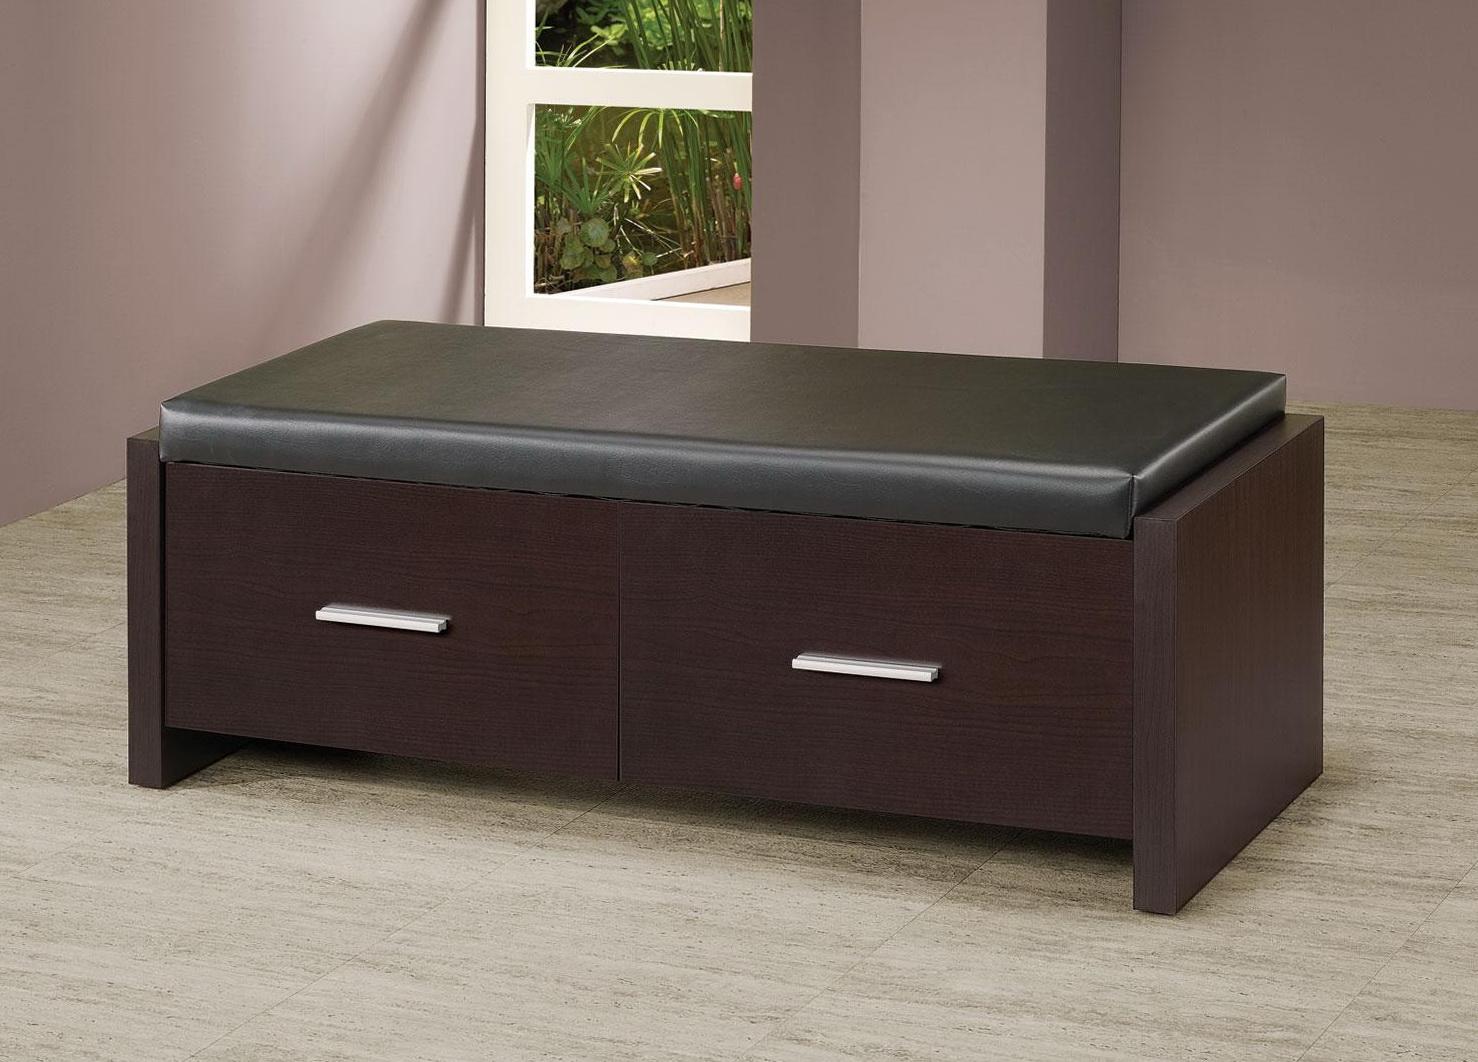 Modern Bedroom Storage Bench